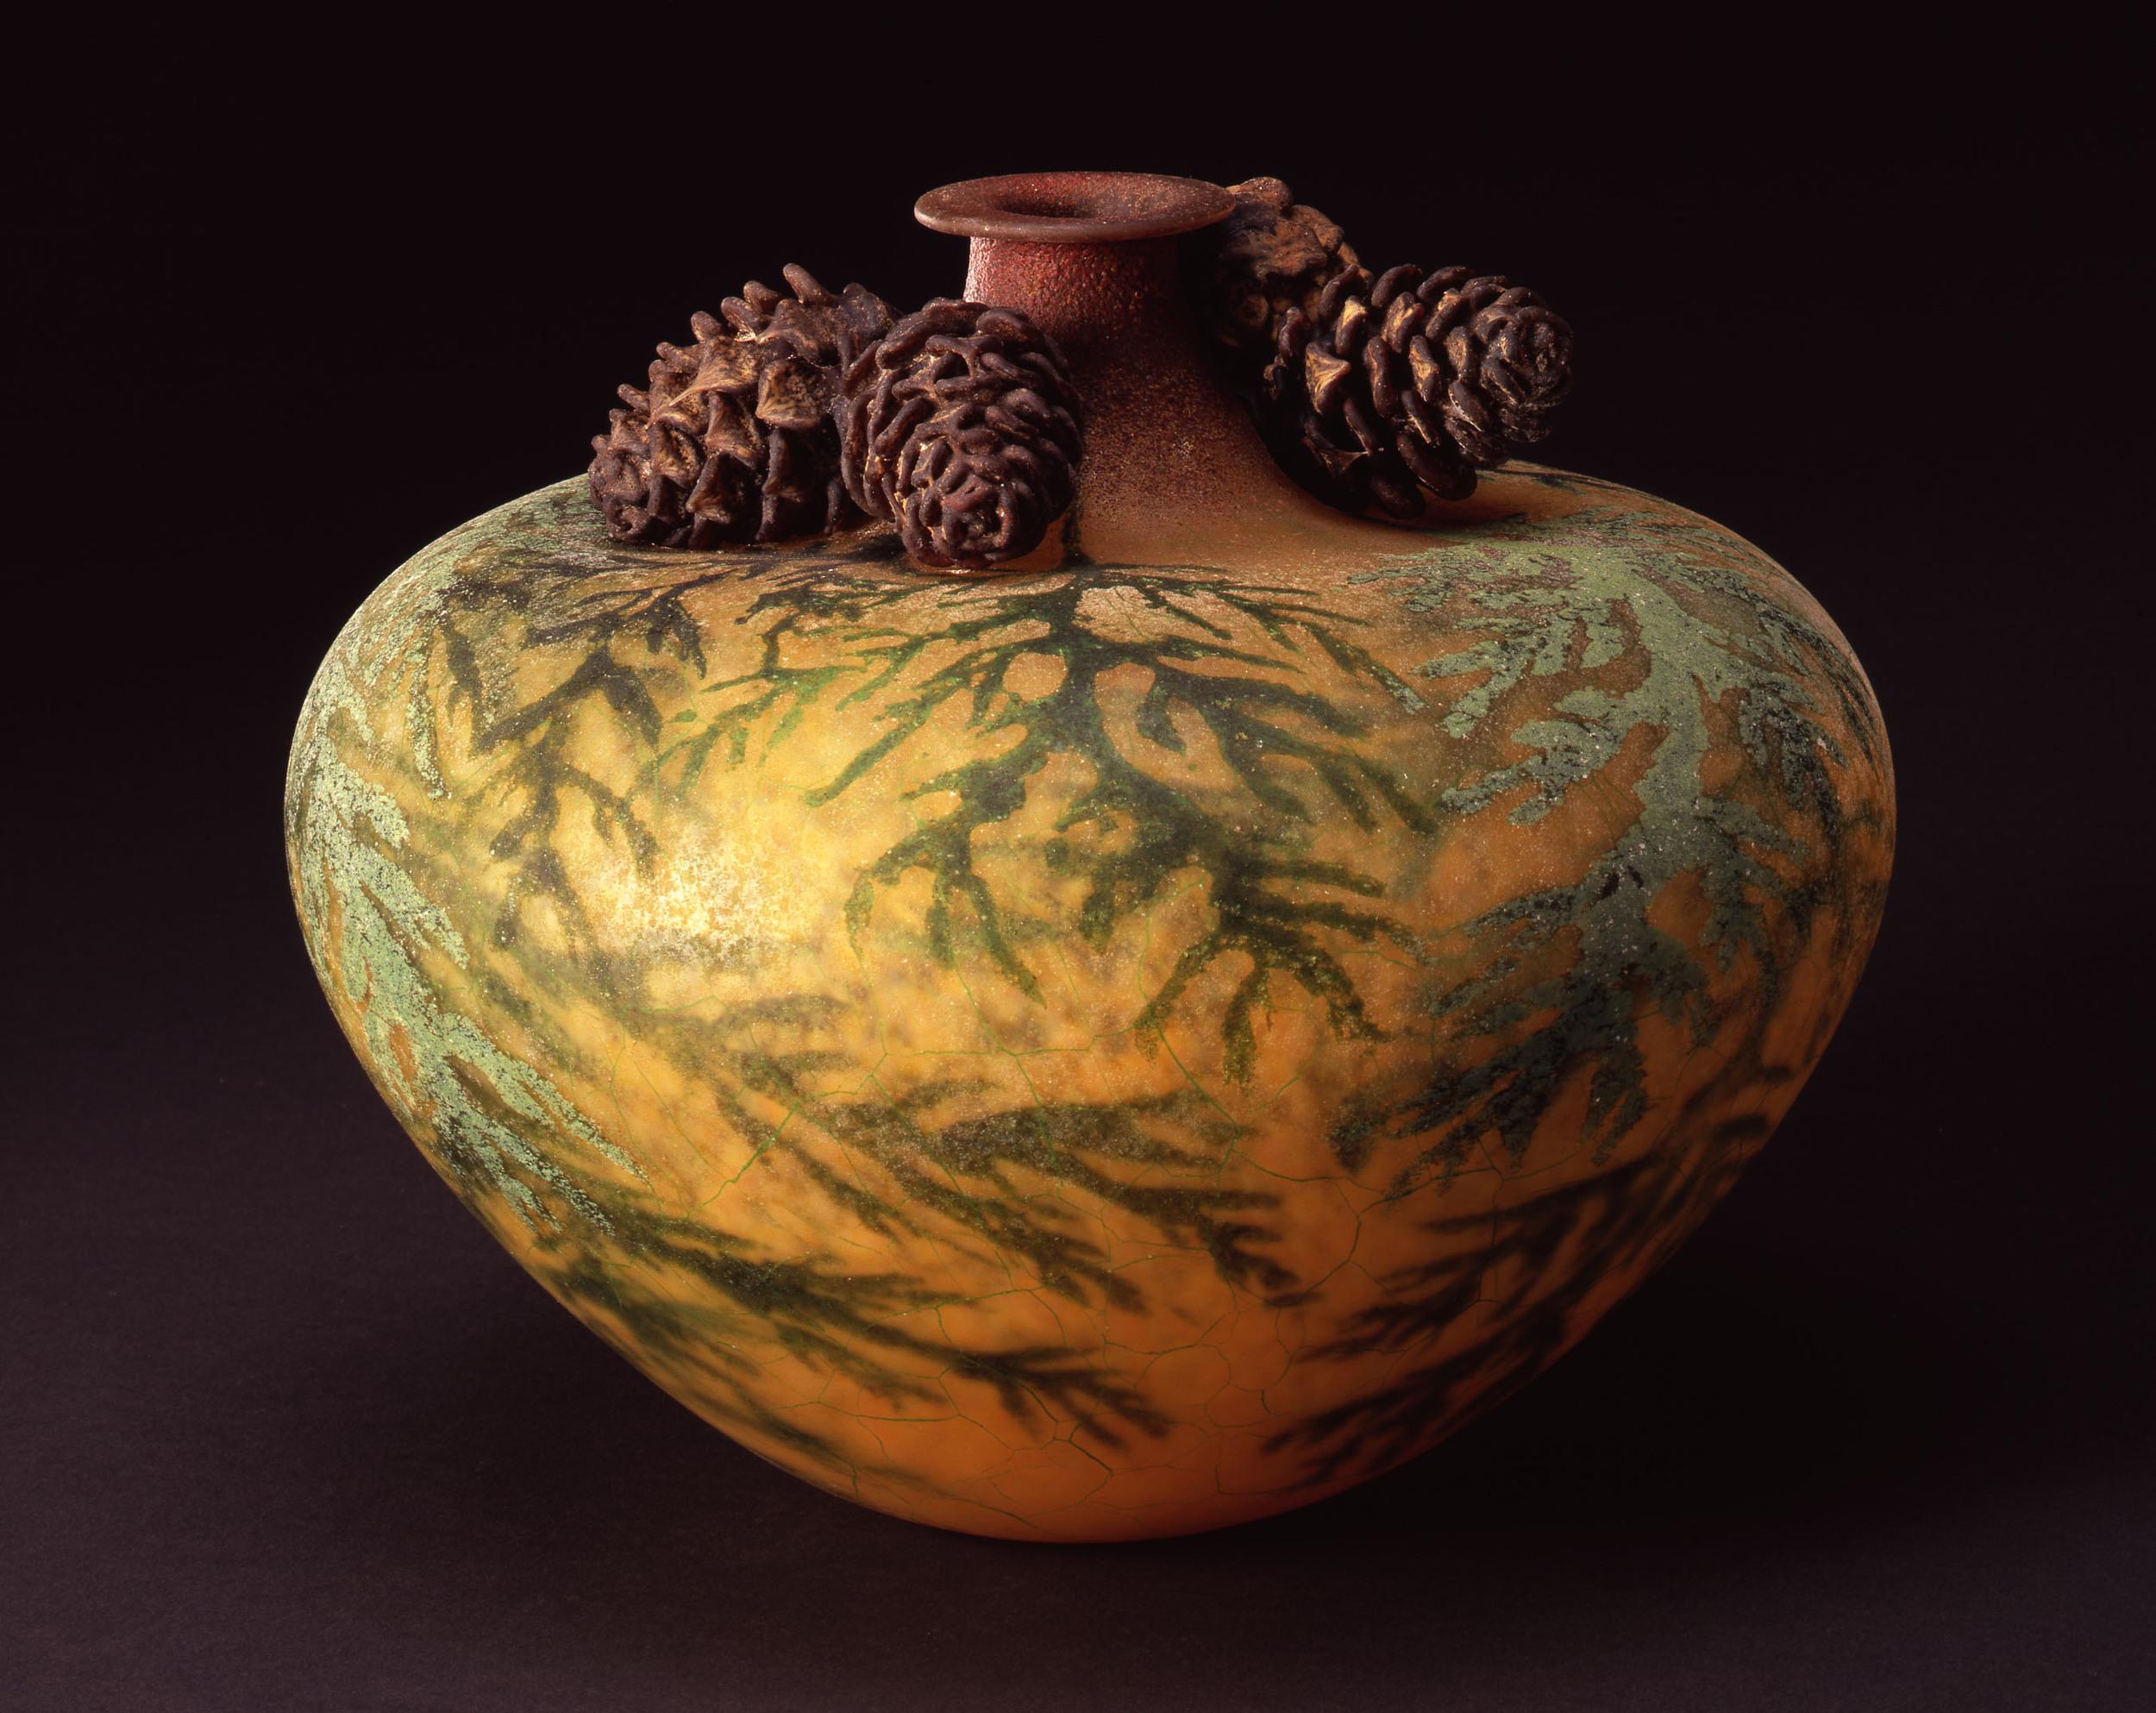 William Morris,  Vase with Cedar Boughs and Cedar Cones   (2004, glass, 7 7/8 x 9 1/8 x 9 1/8 inches), WM.30